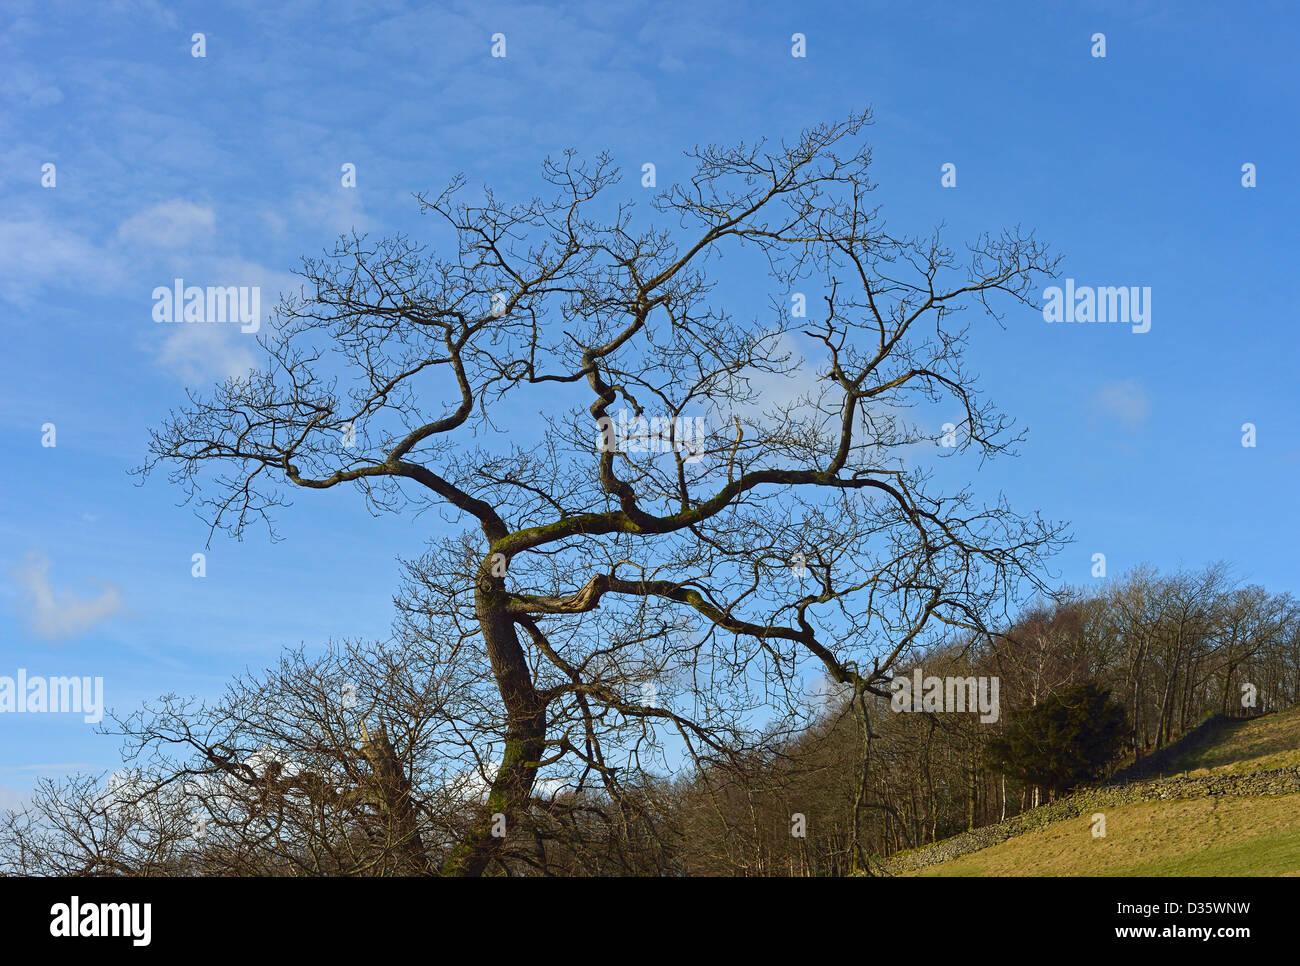 Tree in winter. Common Farm, Windermere, Lake District National Park, Cumbria, England, United Kingdom, Europe. Stock Photo